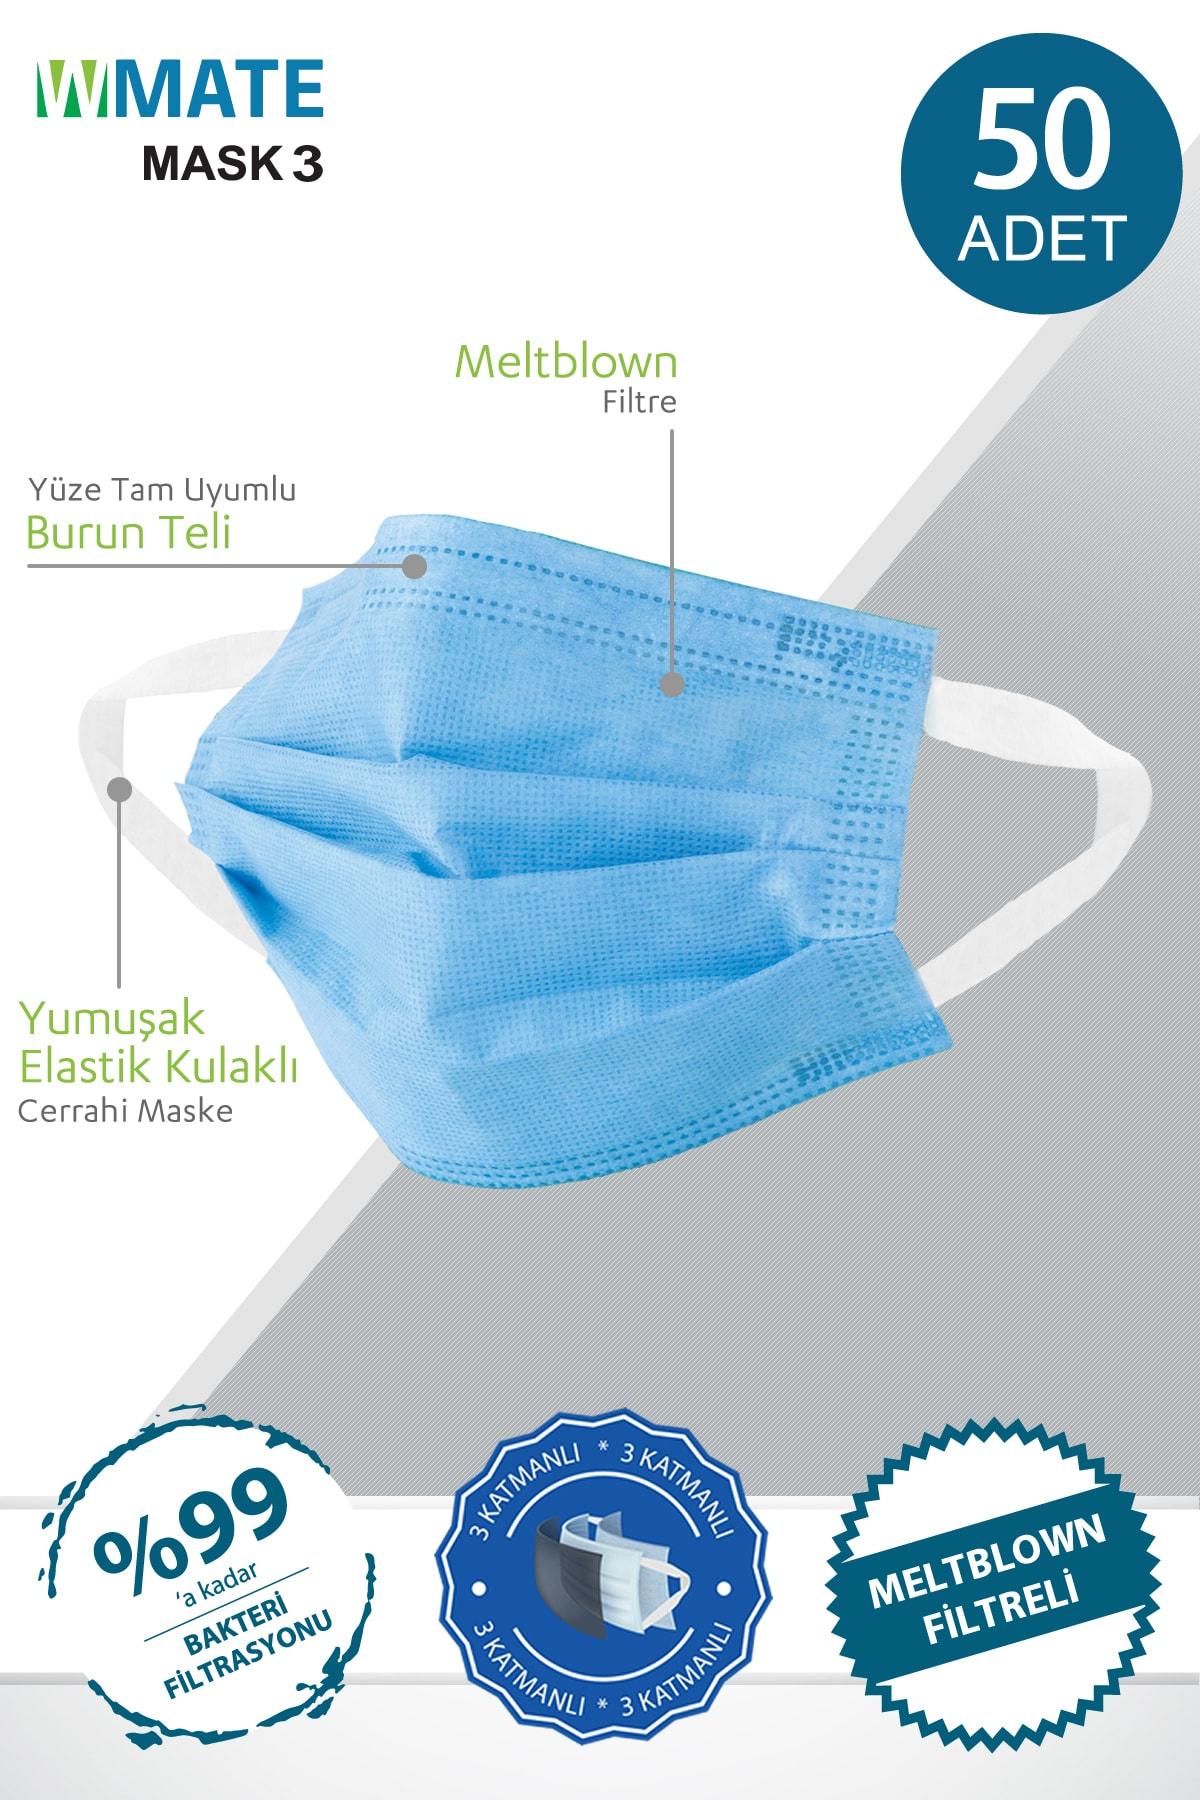 50 Adet Turkuaz Mavi Meltblown Filtreli 3 Katlı Yeni Nesil Maske 10'lu Özel Poşet